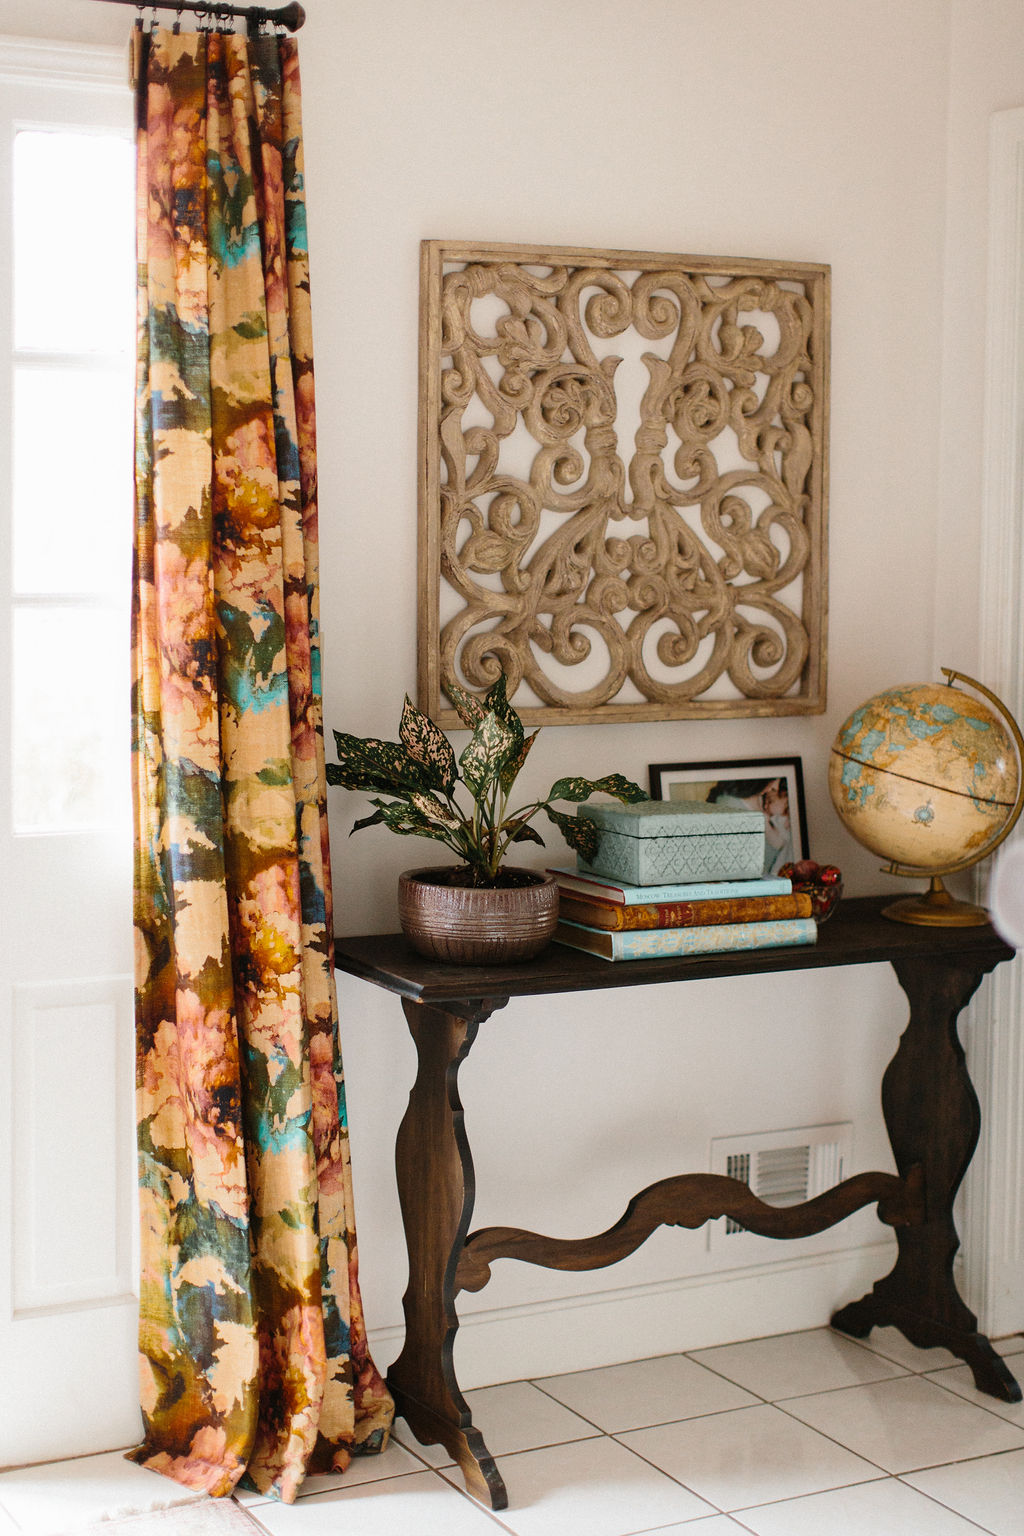 Journey-Jacobs-Design-Studio-Louisville-Residential-Commercial-Hospitality-Interior-Design-Traditional-Modern-5.JPG